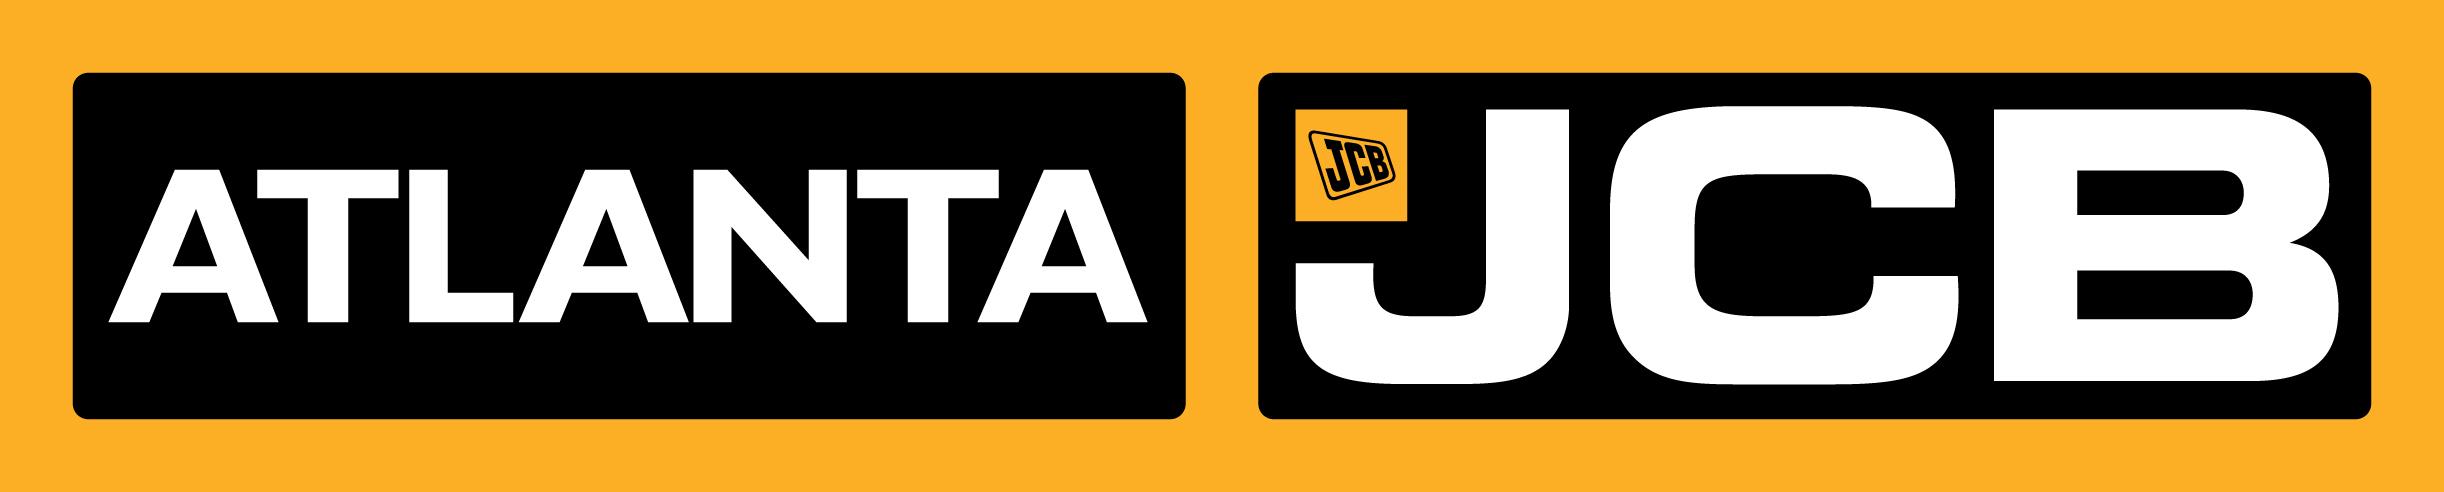 Atlanta JCB company logo